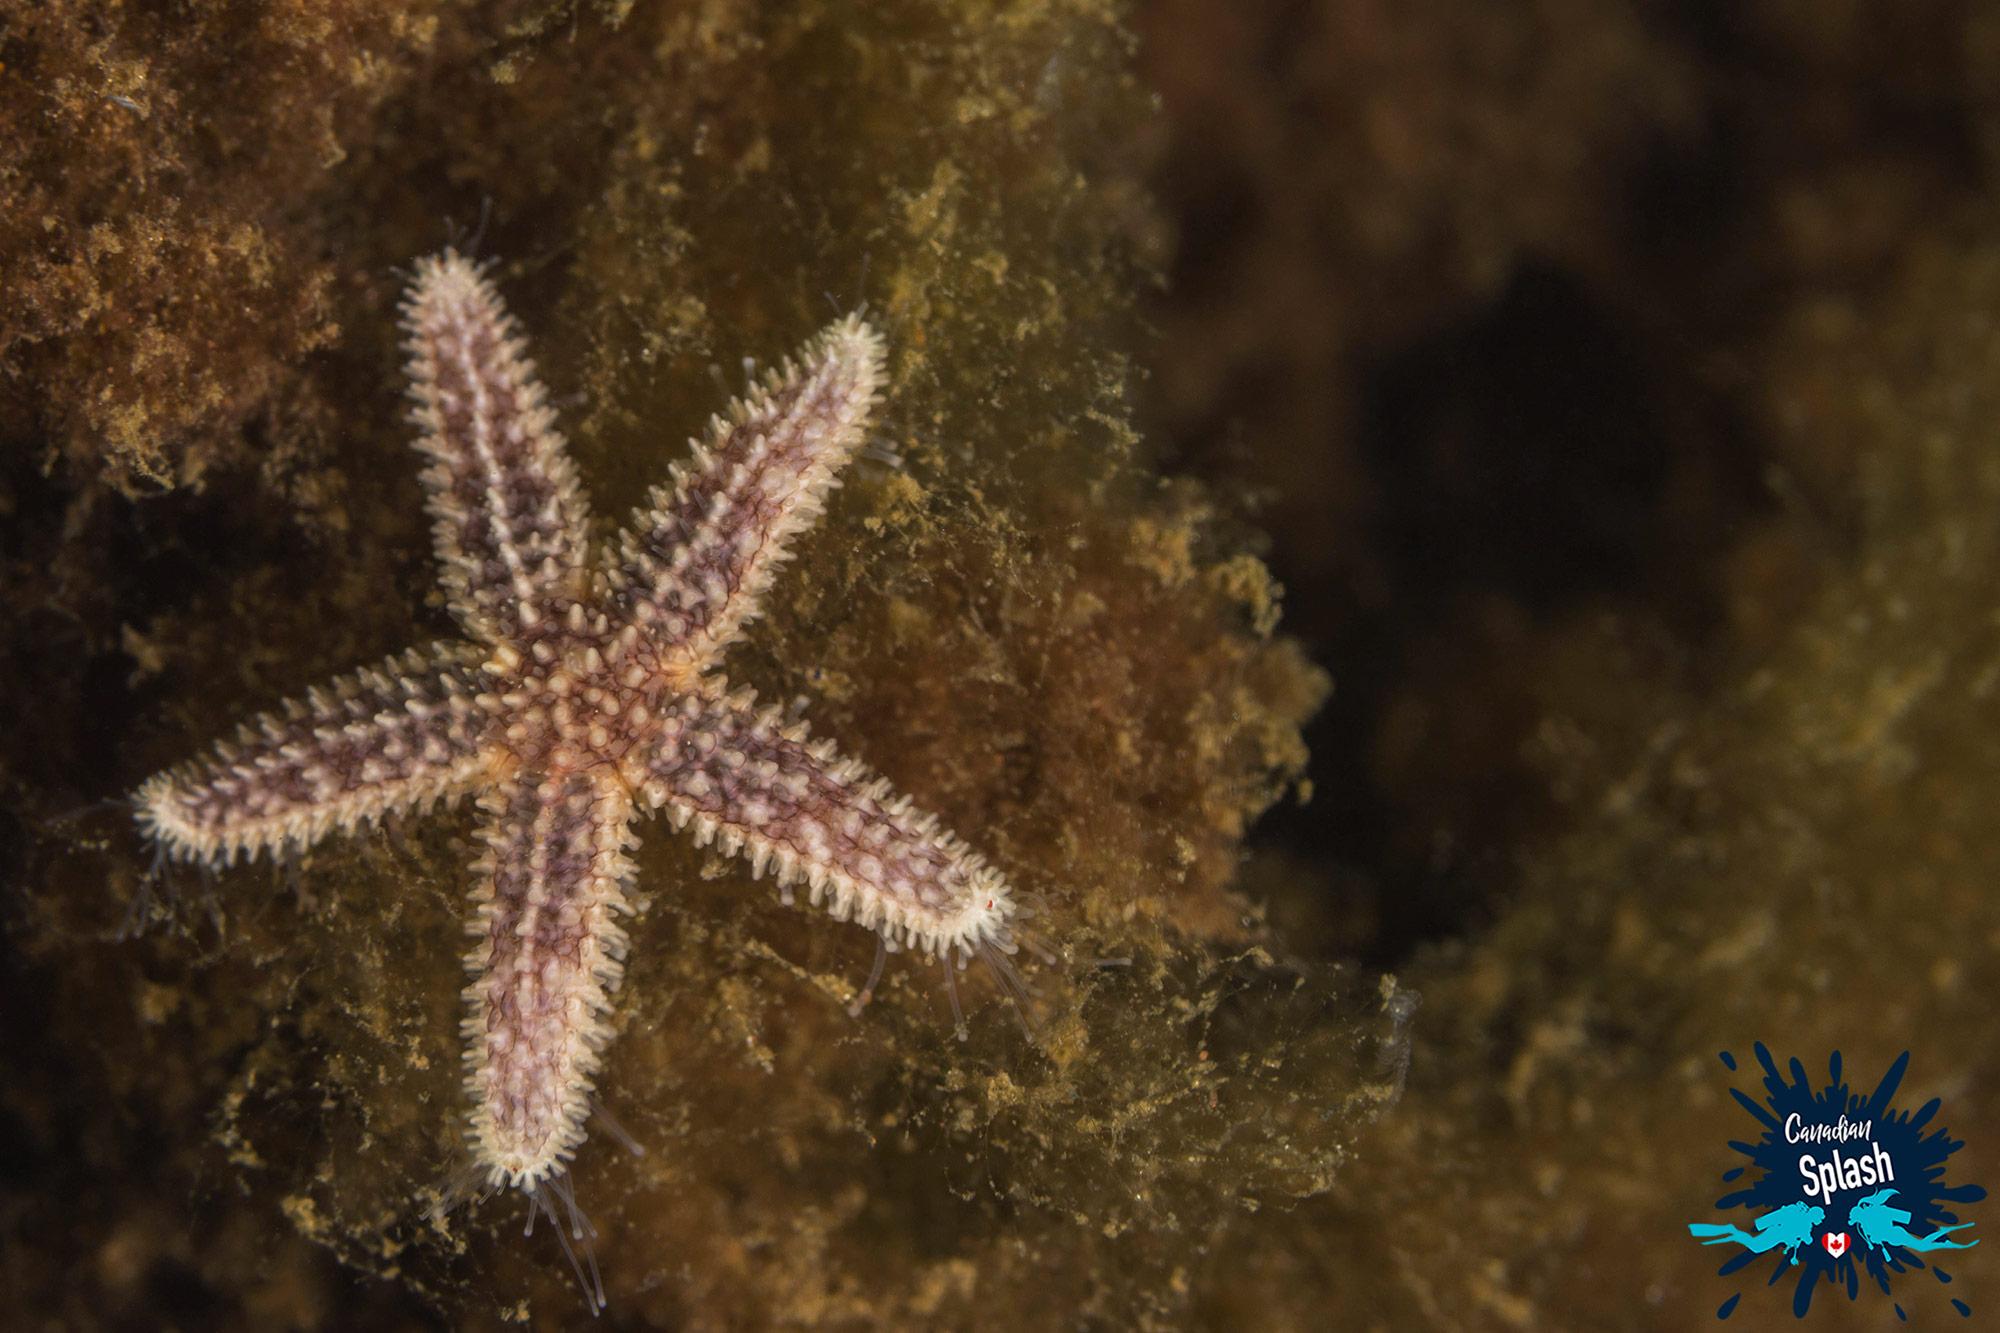 Purple Sea Star On Kelp In Nova Scotia, Canada Diving